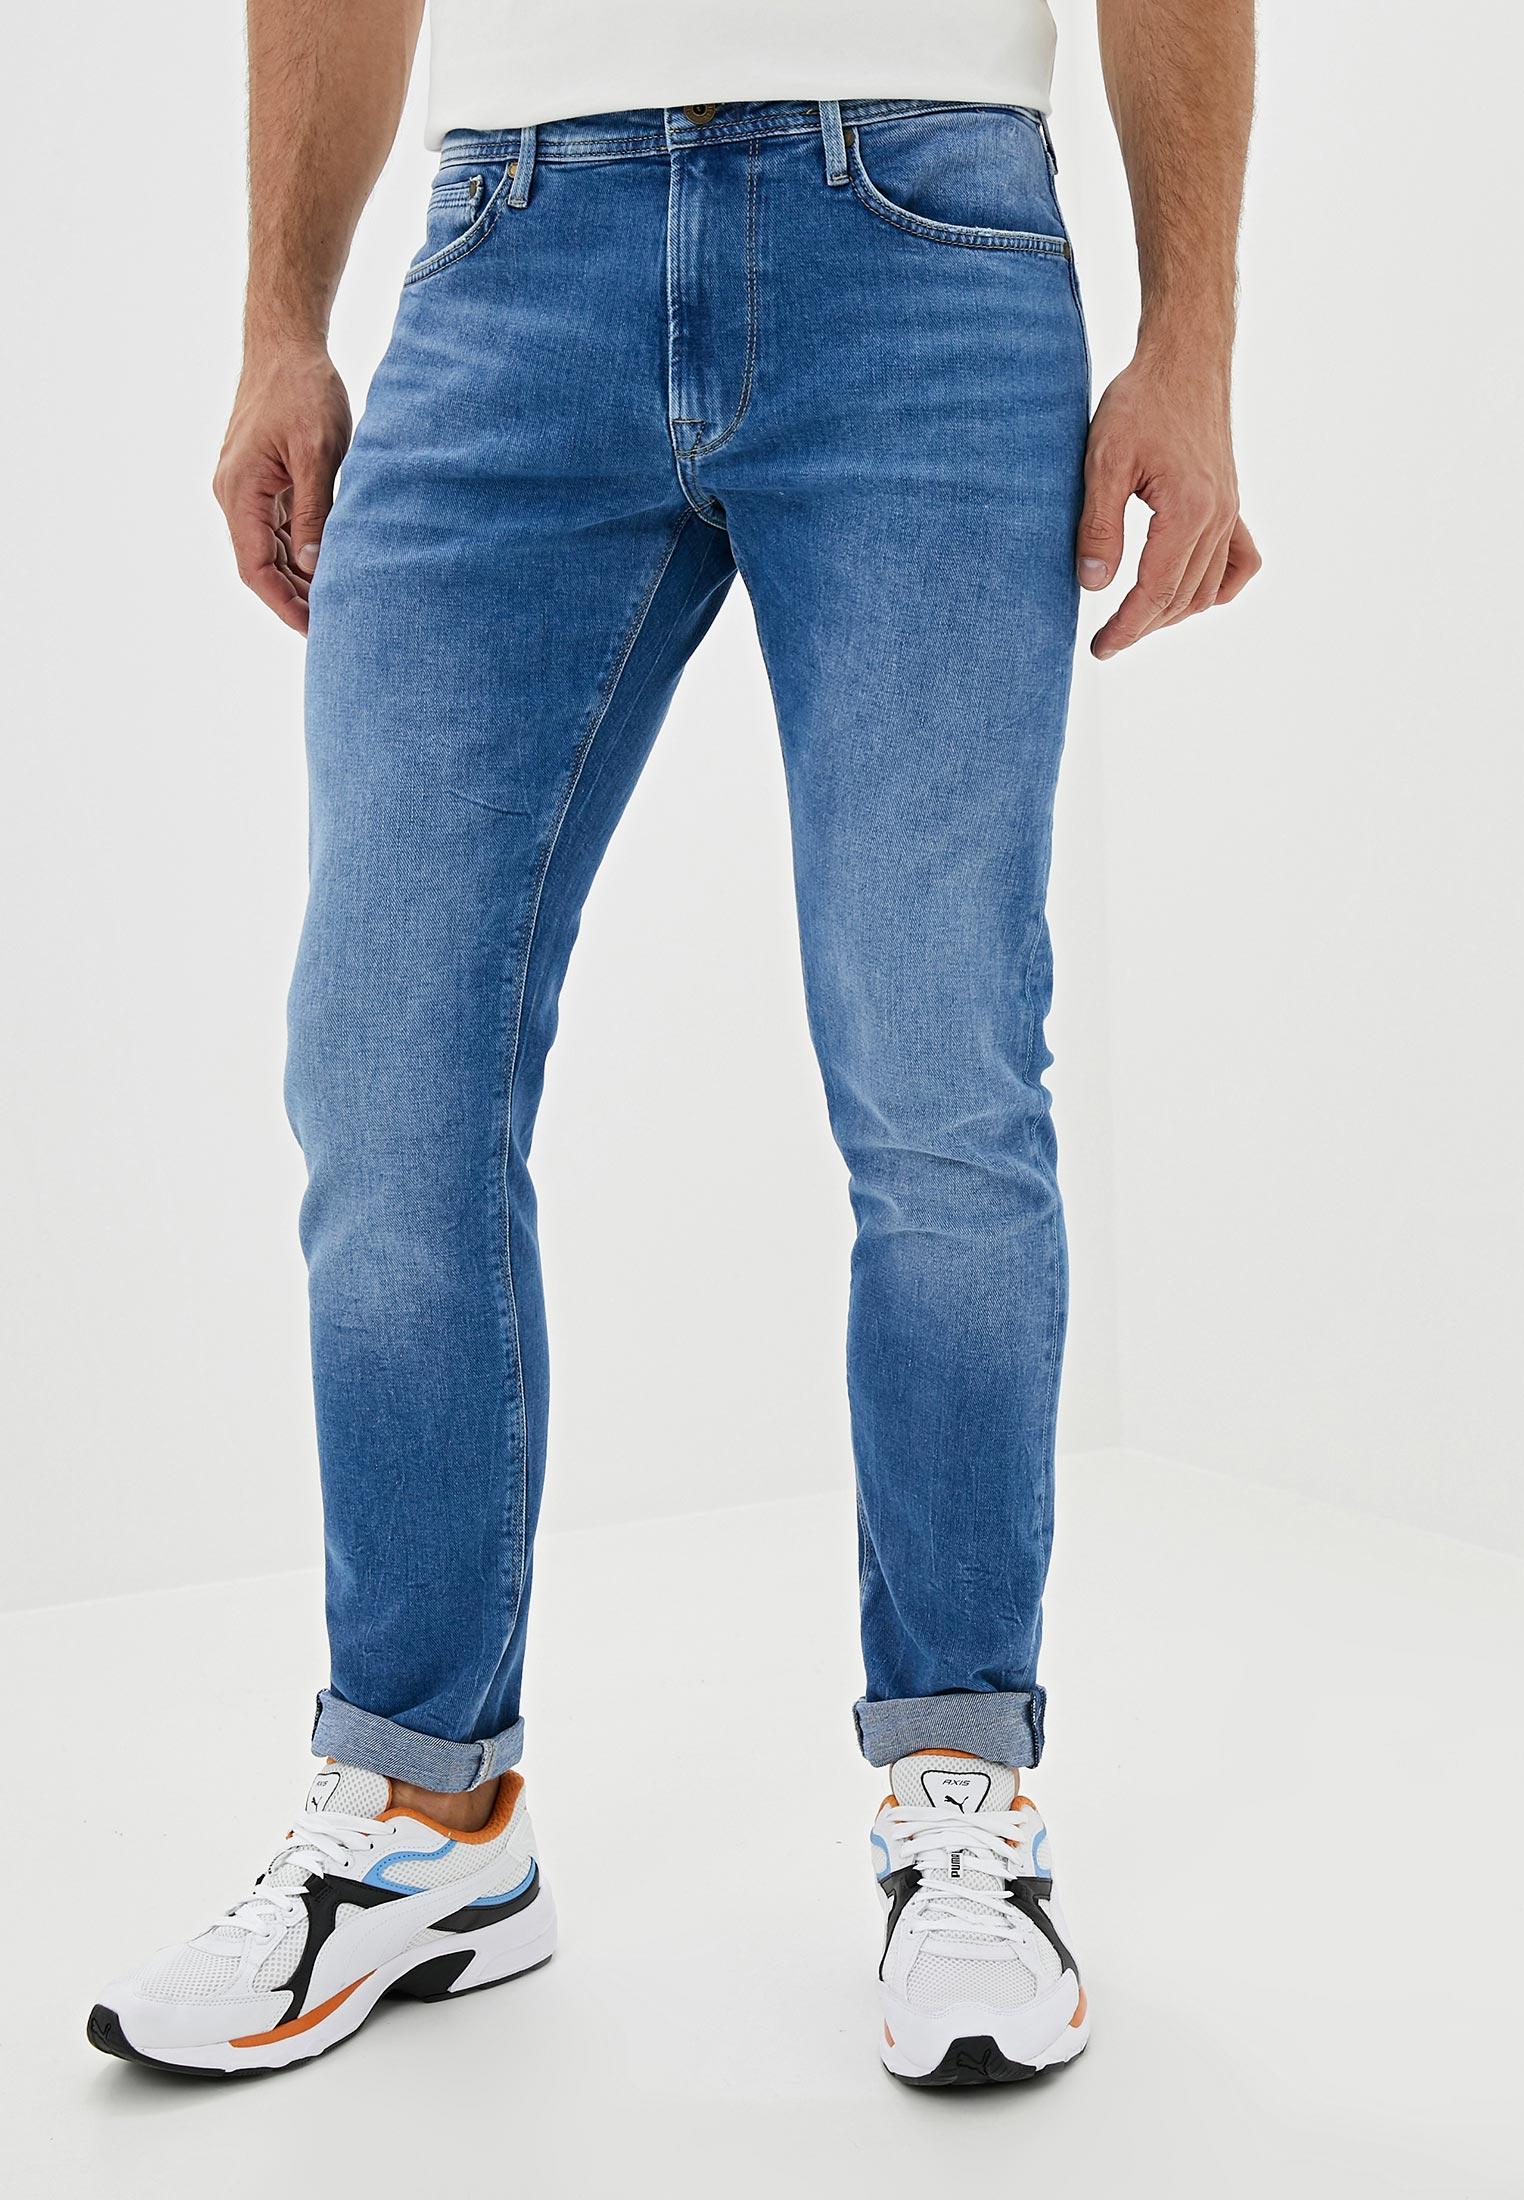 Зауженные джинсы Pepe Jeans (Пепе Джинс) PM201705GR5